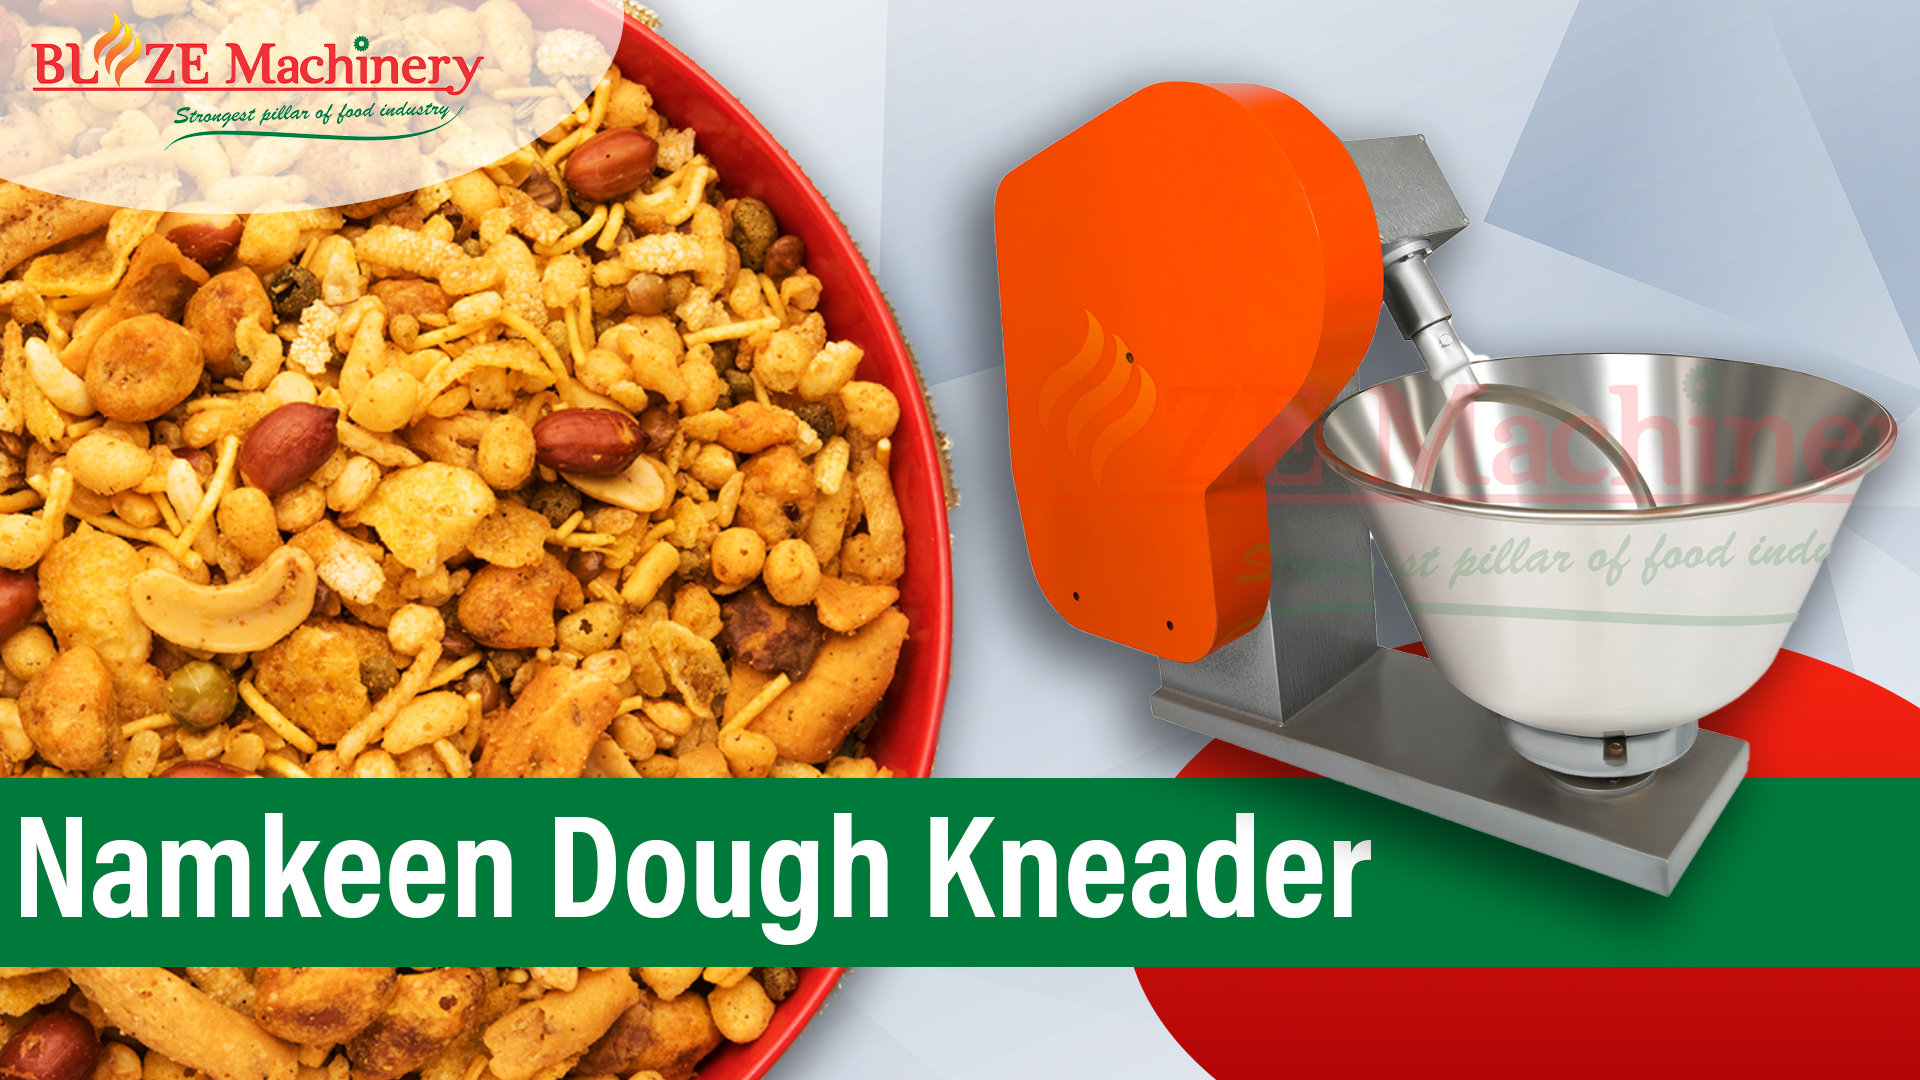 Namkeen Dough Kneader